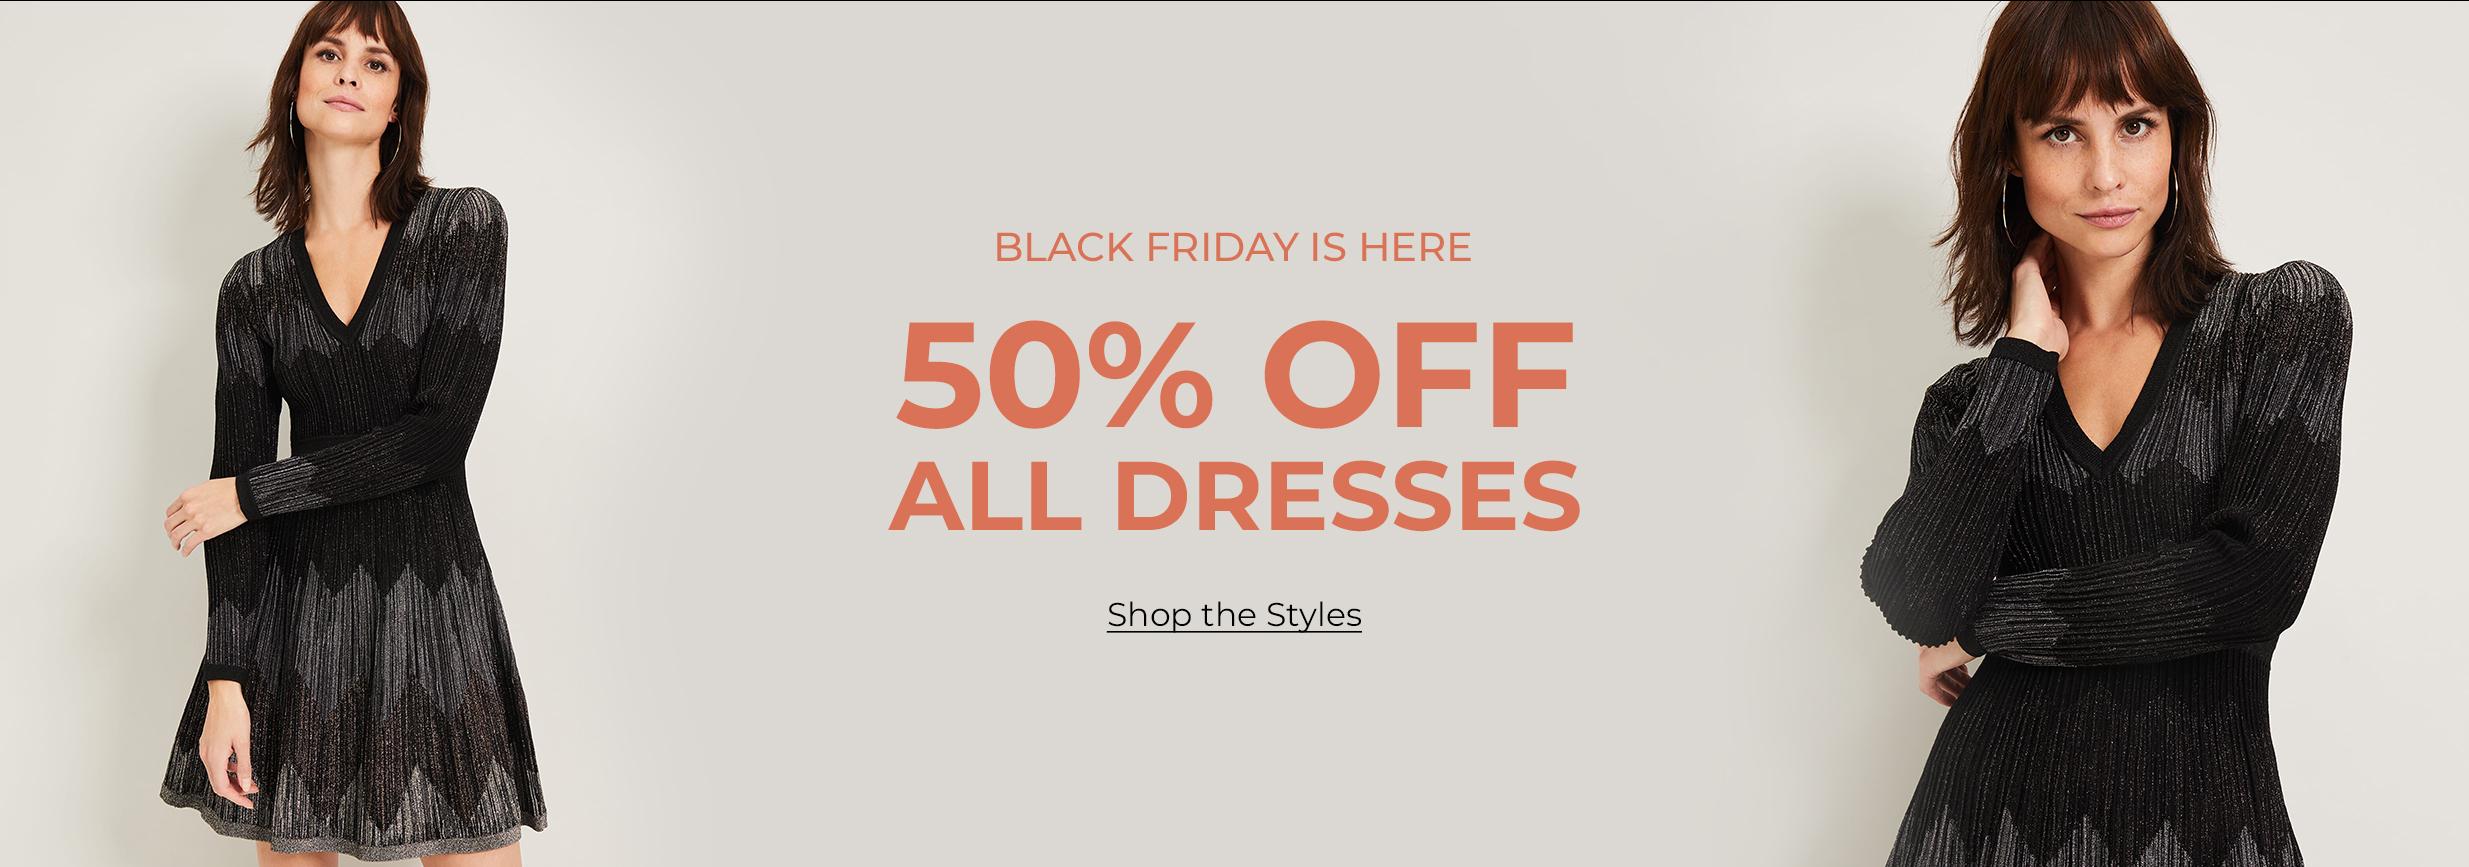 Black Friday - 50% off all dresses